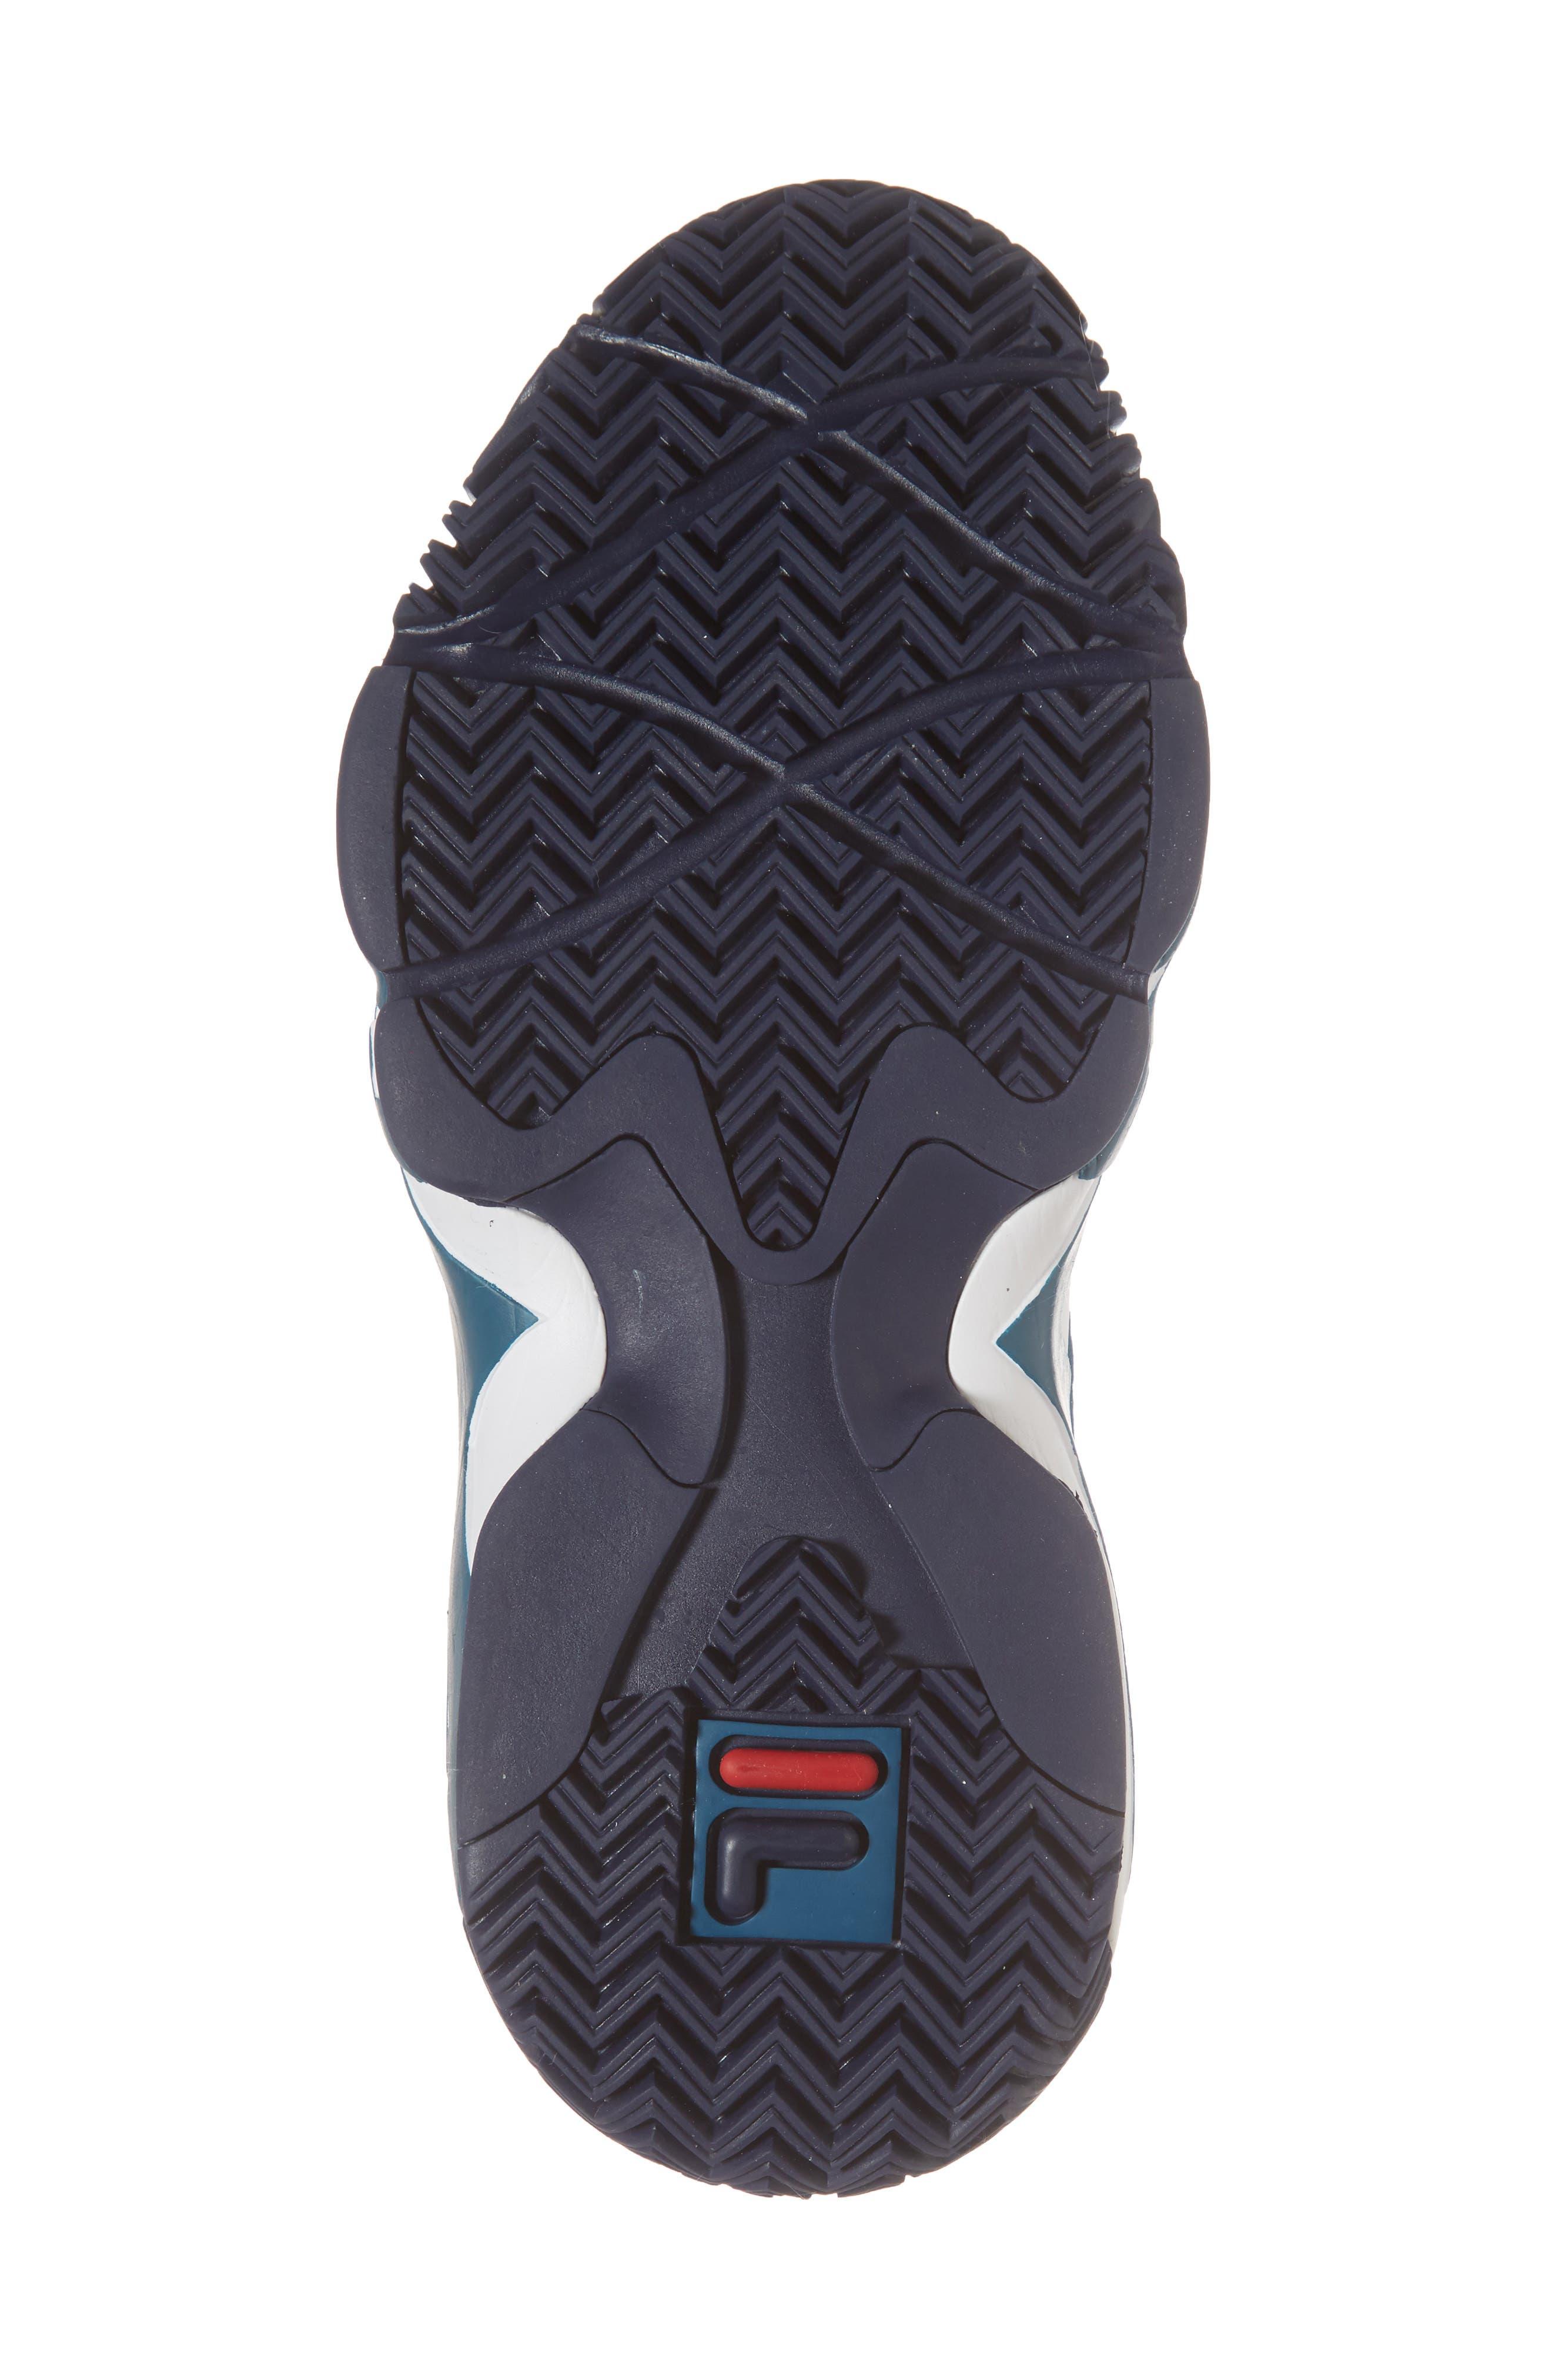 MB High Top Sneaker,                             Alternate thumbnail 6, color,                             INK BLUE/ FILA NAVY